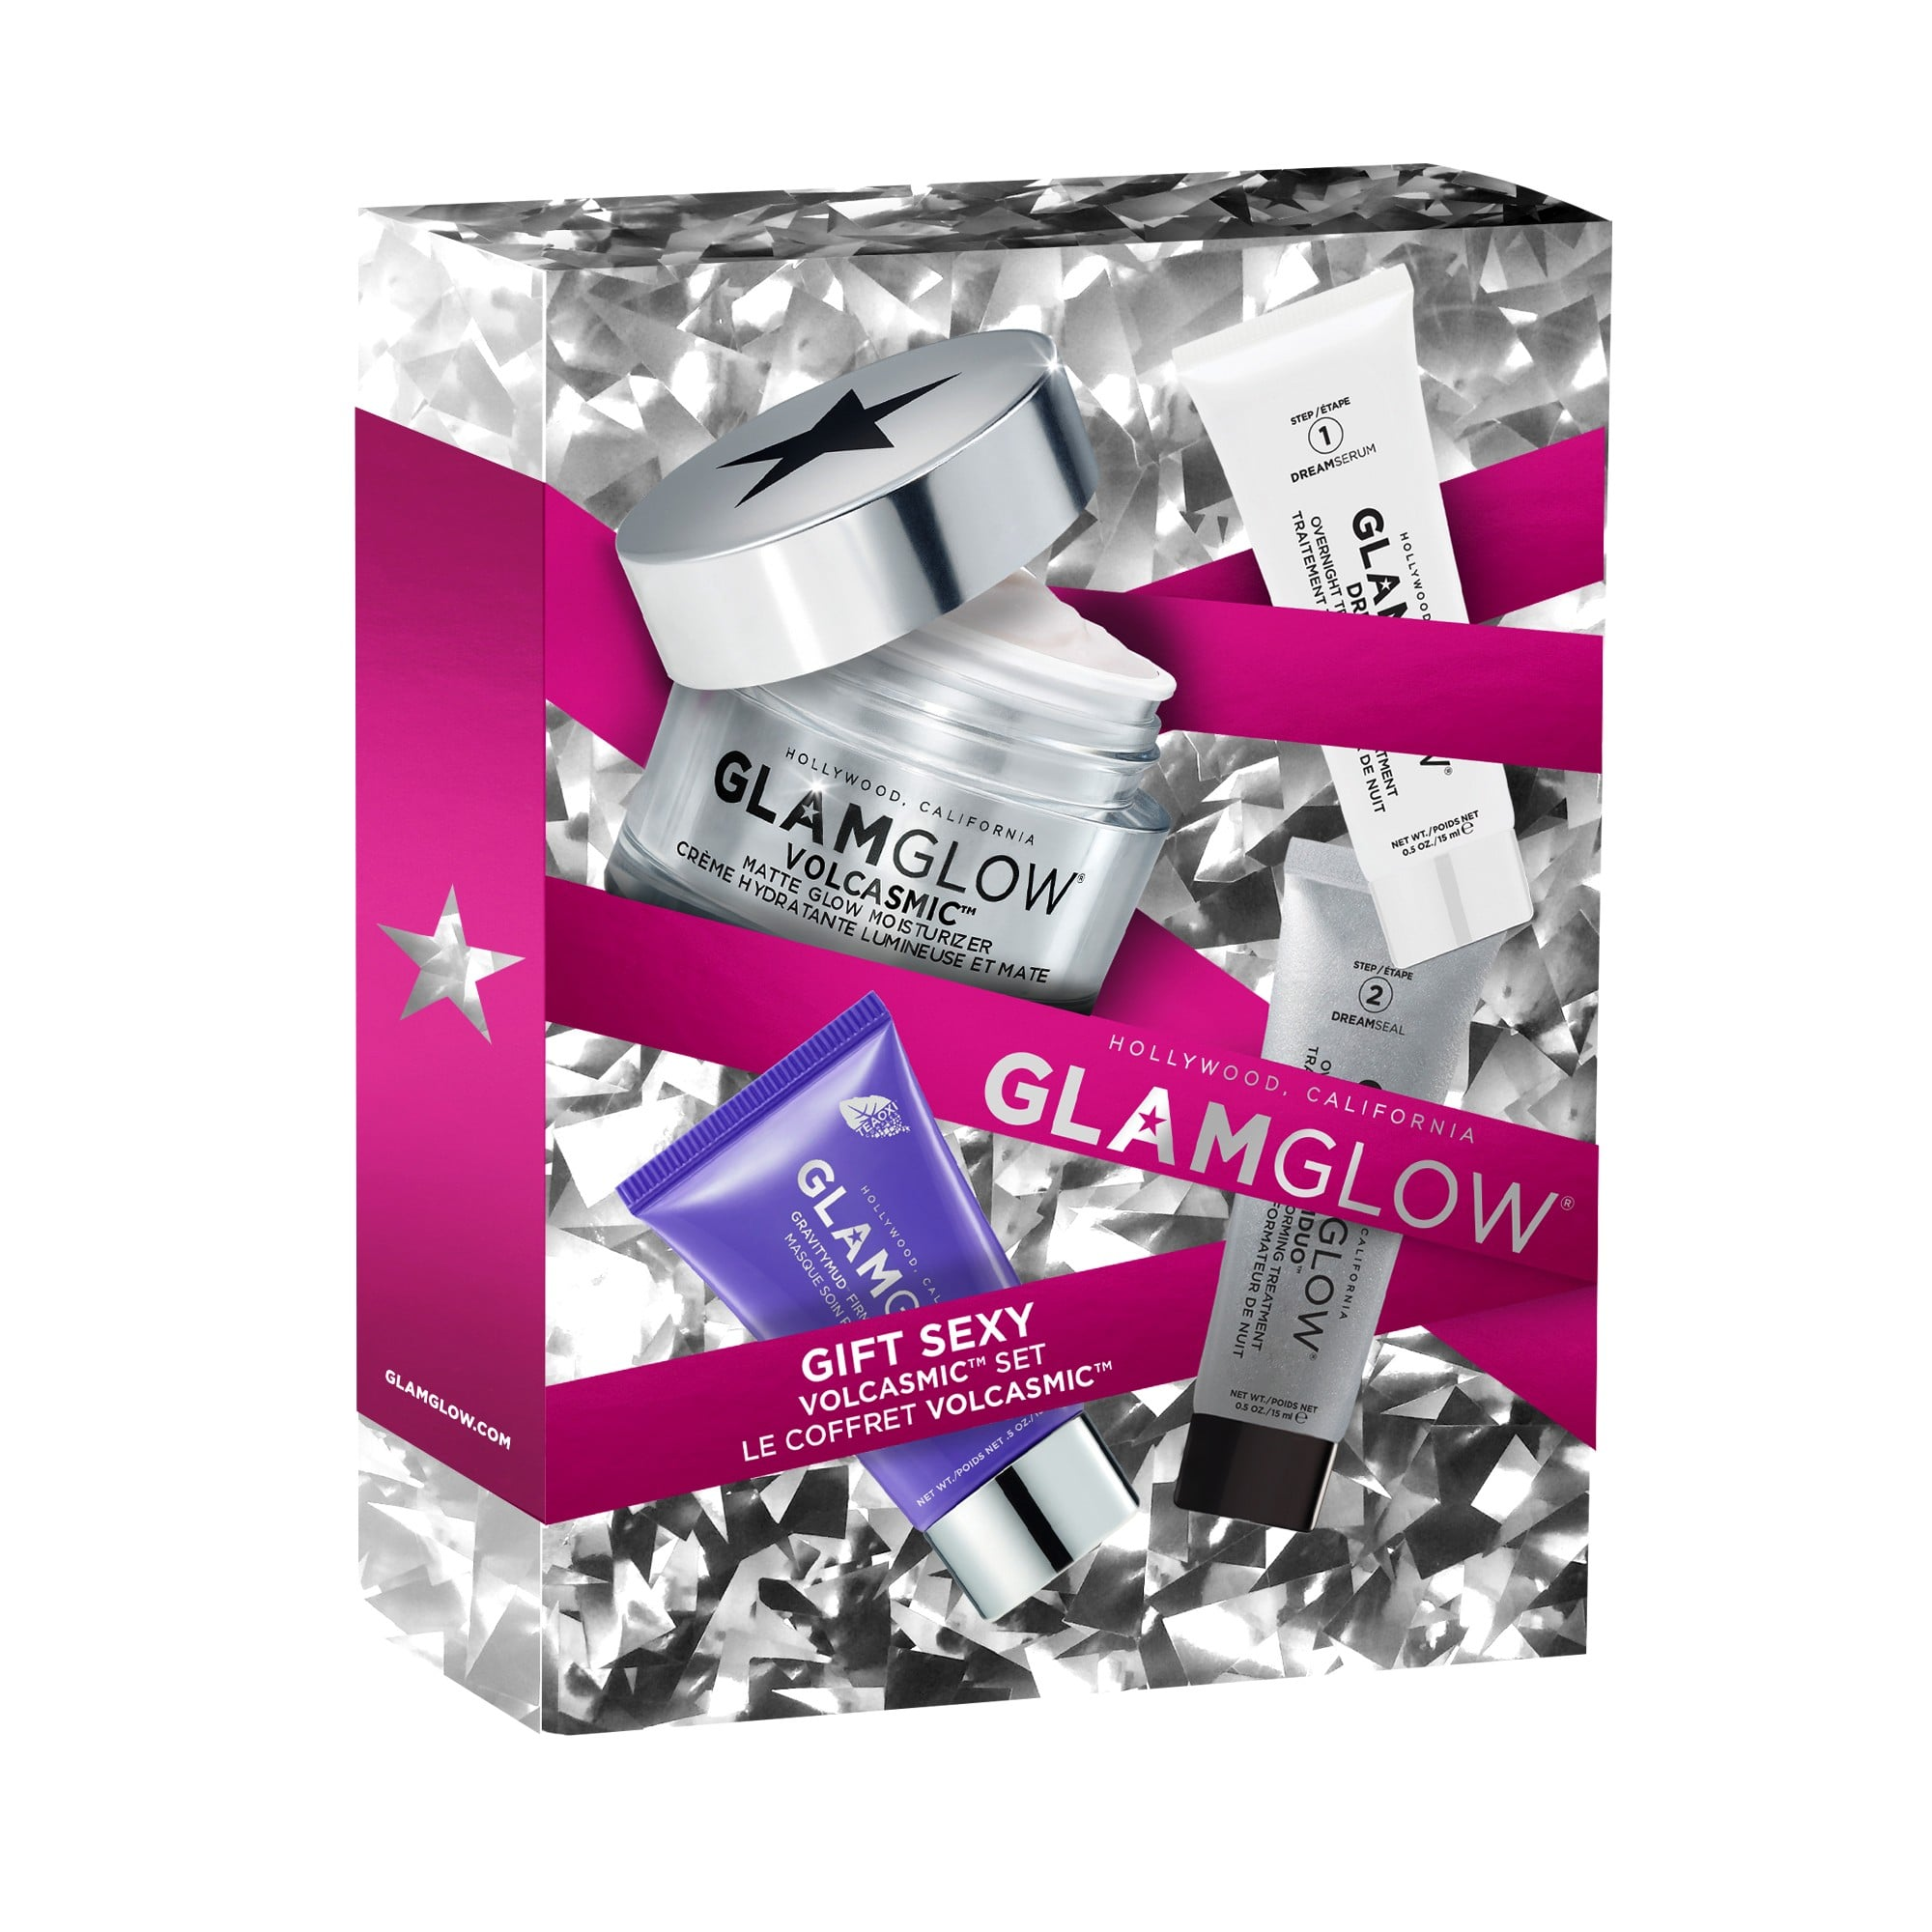 Sephora Holiday Gift Sets 2018 Popsugar Beauty